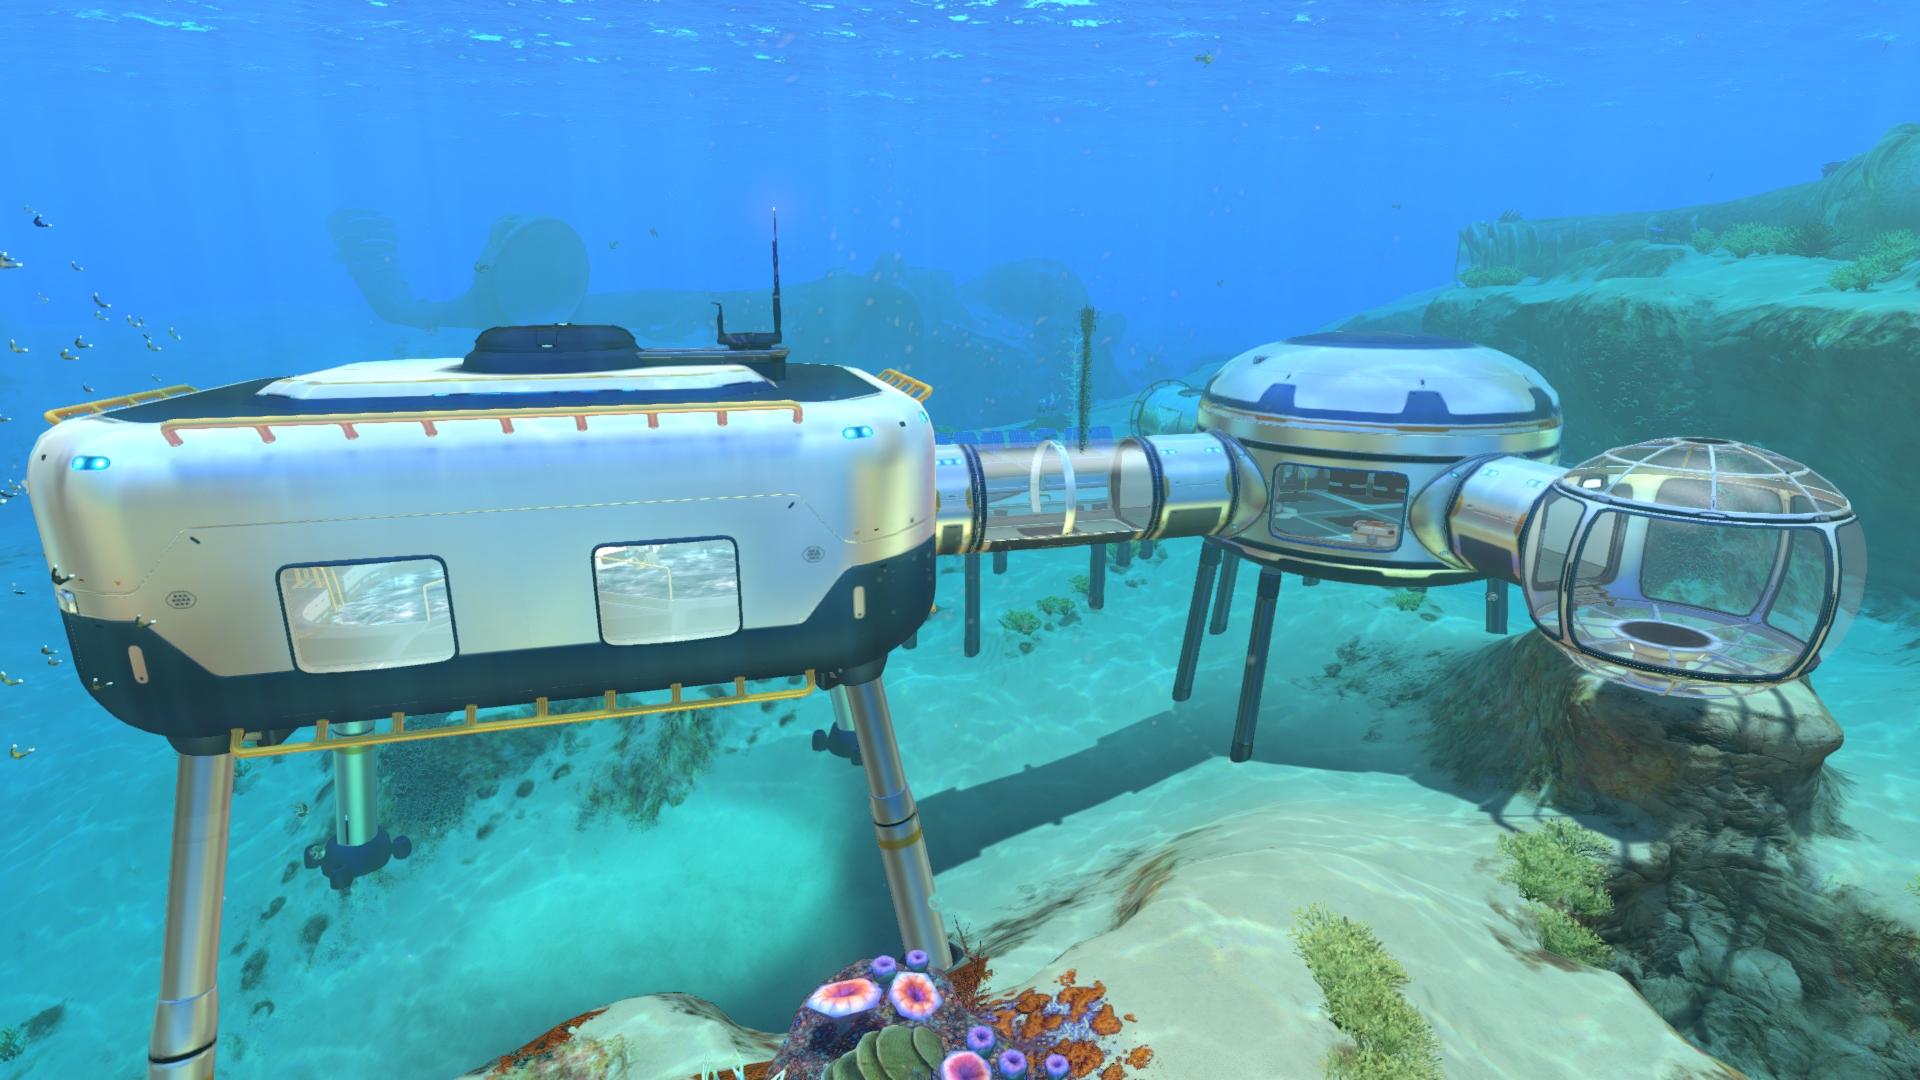 Bases Submarinas Wikia Subnautica Fandom Powered By Wikia